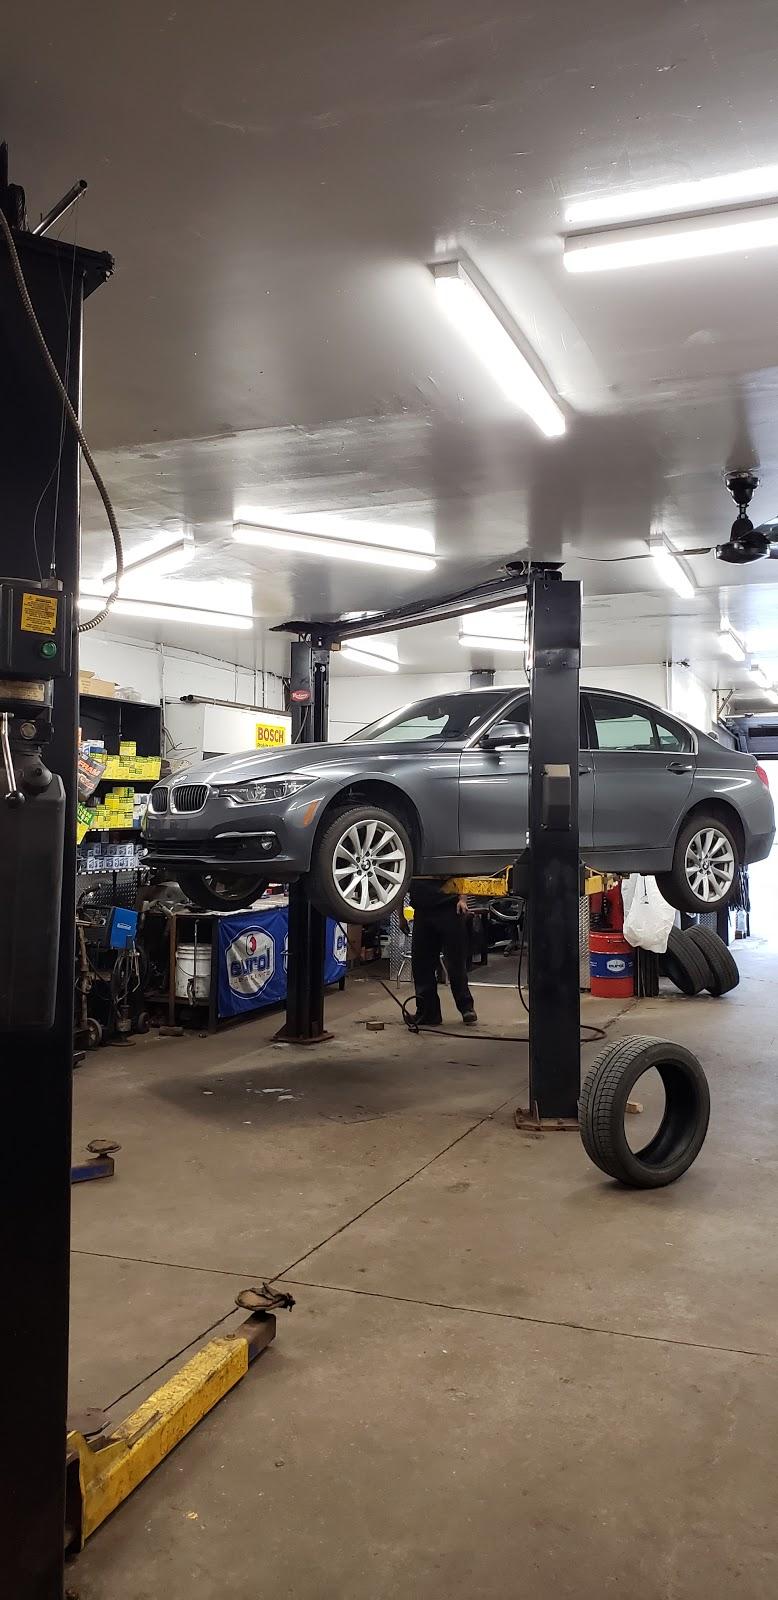 Garage Sport CDN inc. | car repair | 8 Place Legault, Mont-Royal, QC H4P 1Y1, Canada | 5147387433 OR +1 514-738-7433